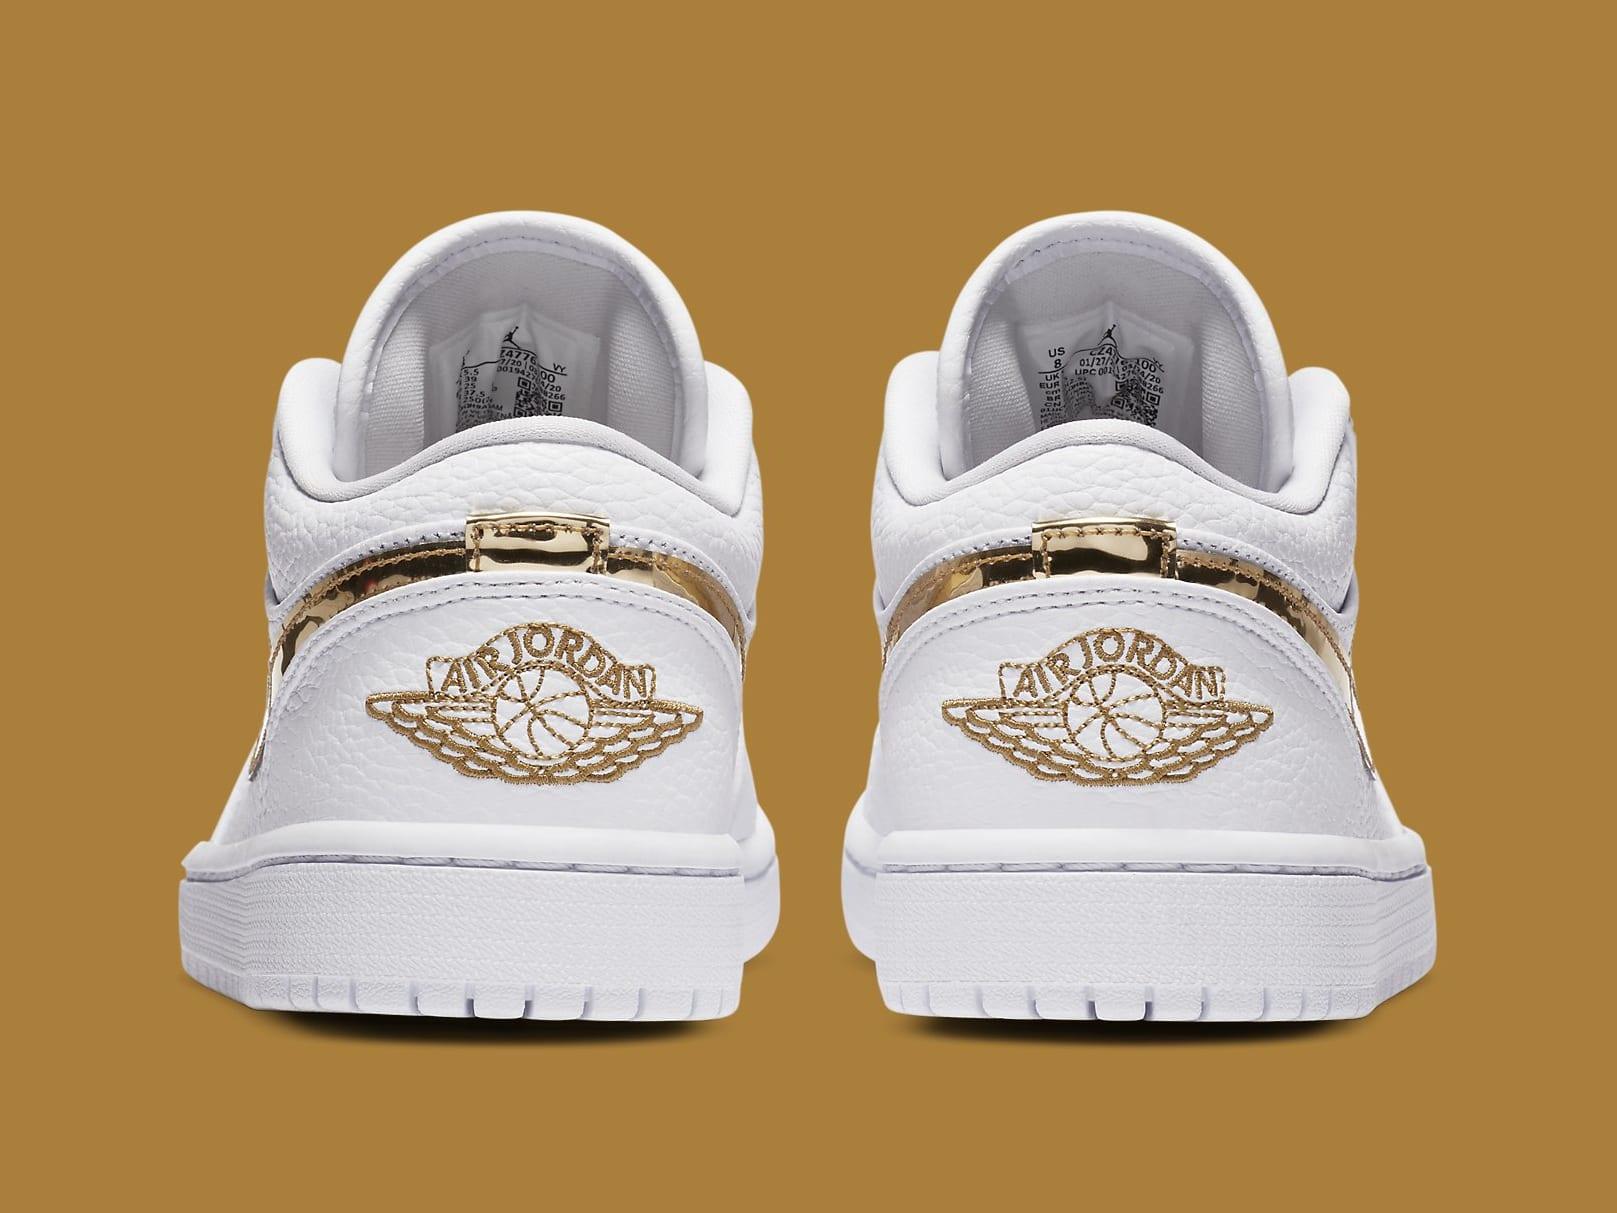 Air Jordan 1 Low White Metallic Gold Release Date CZ4776-100 Heel